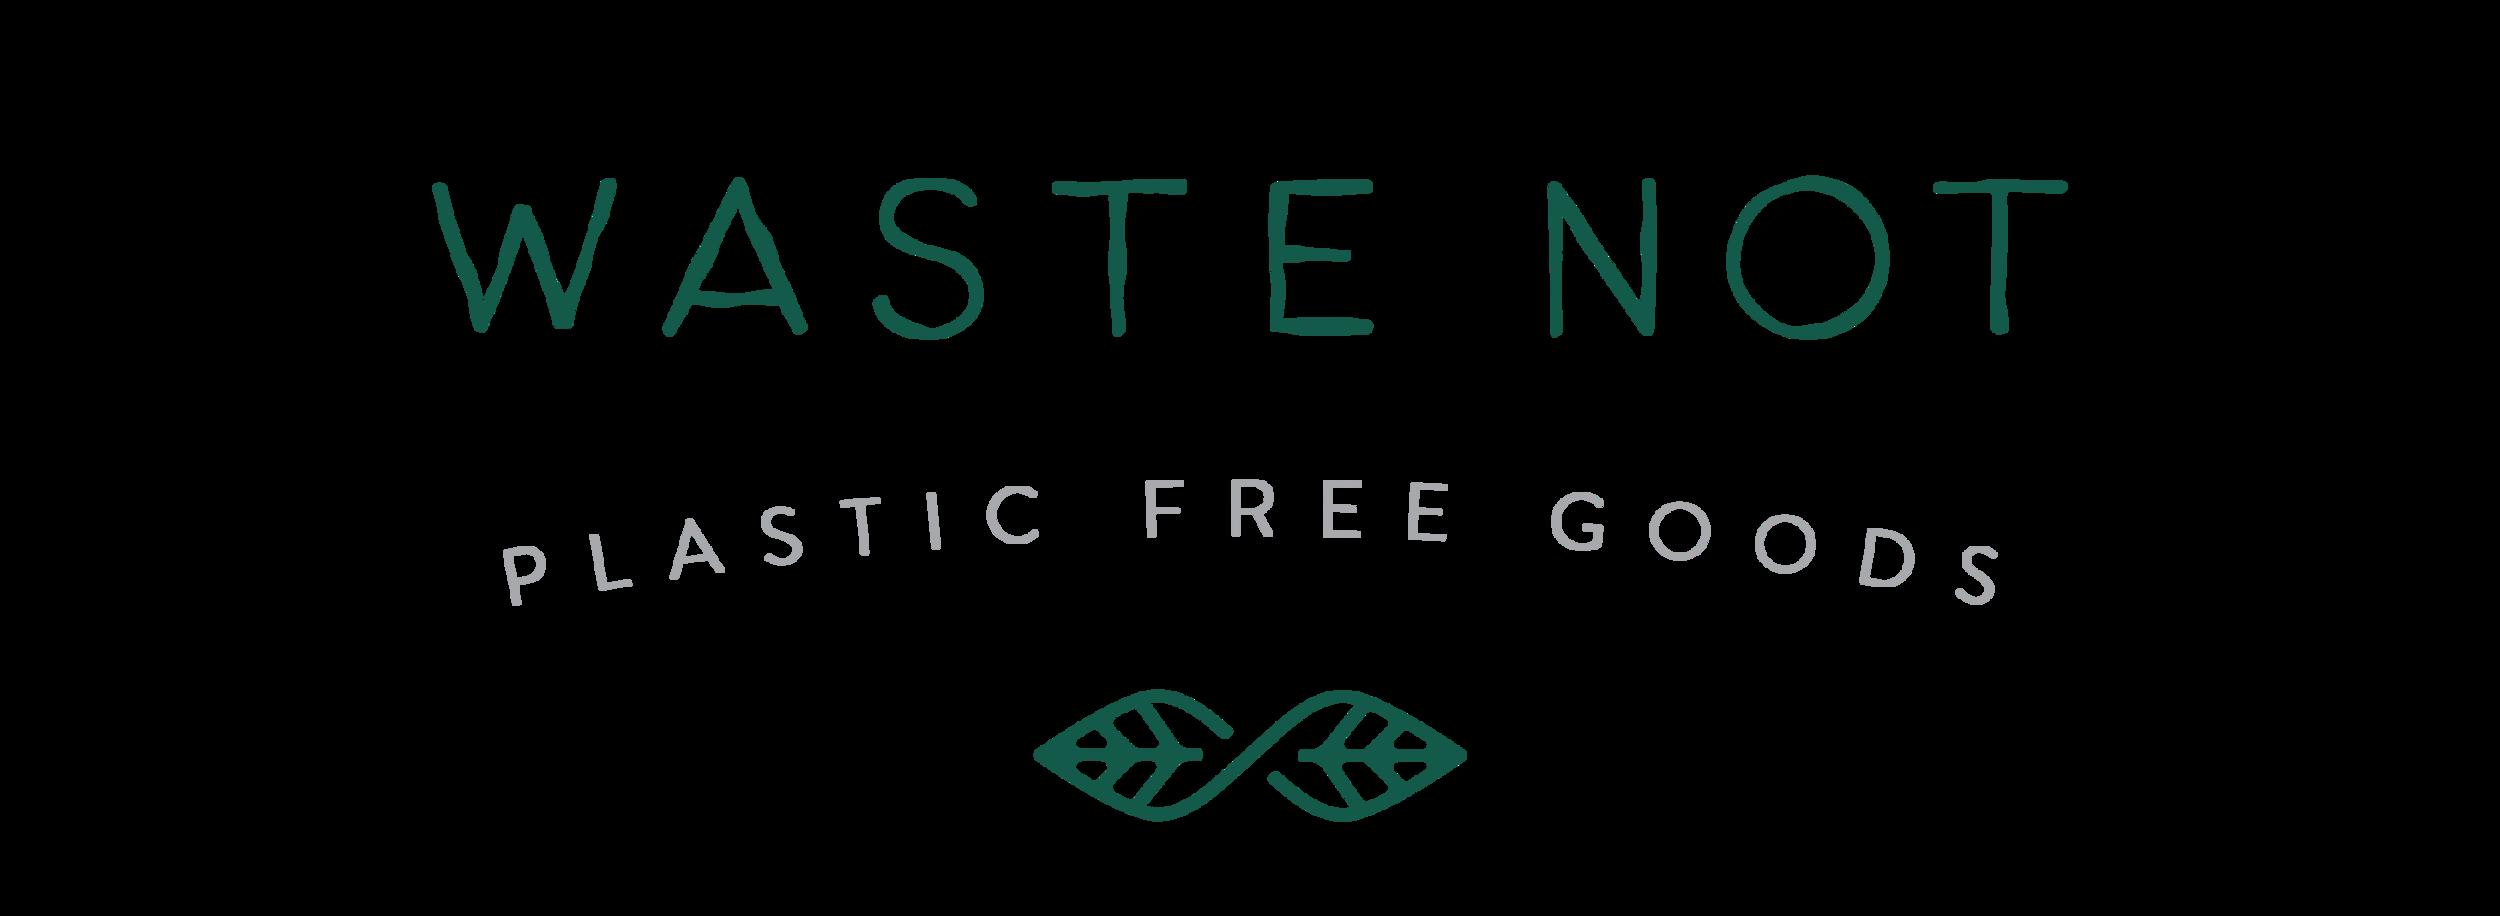 WasteNot_Logo-01 - Copy.png